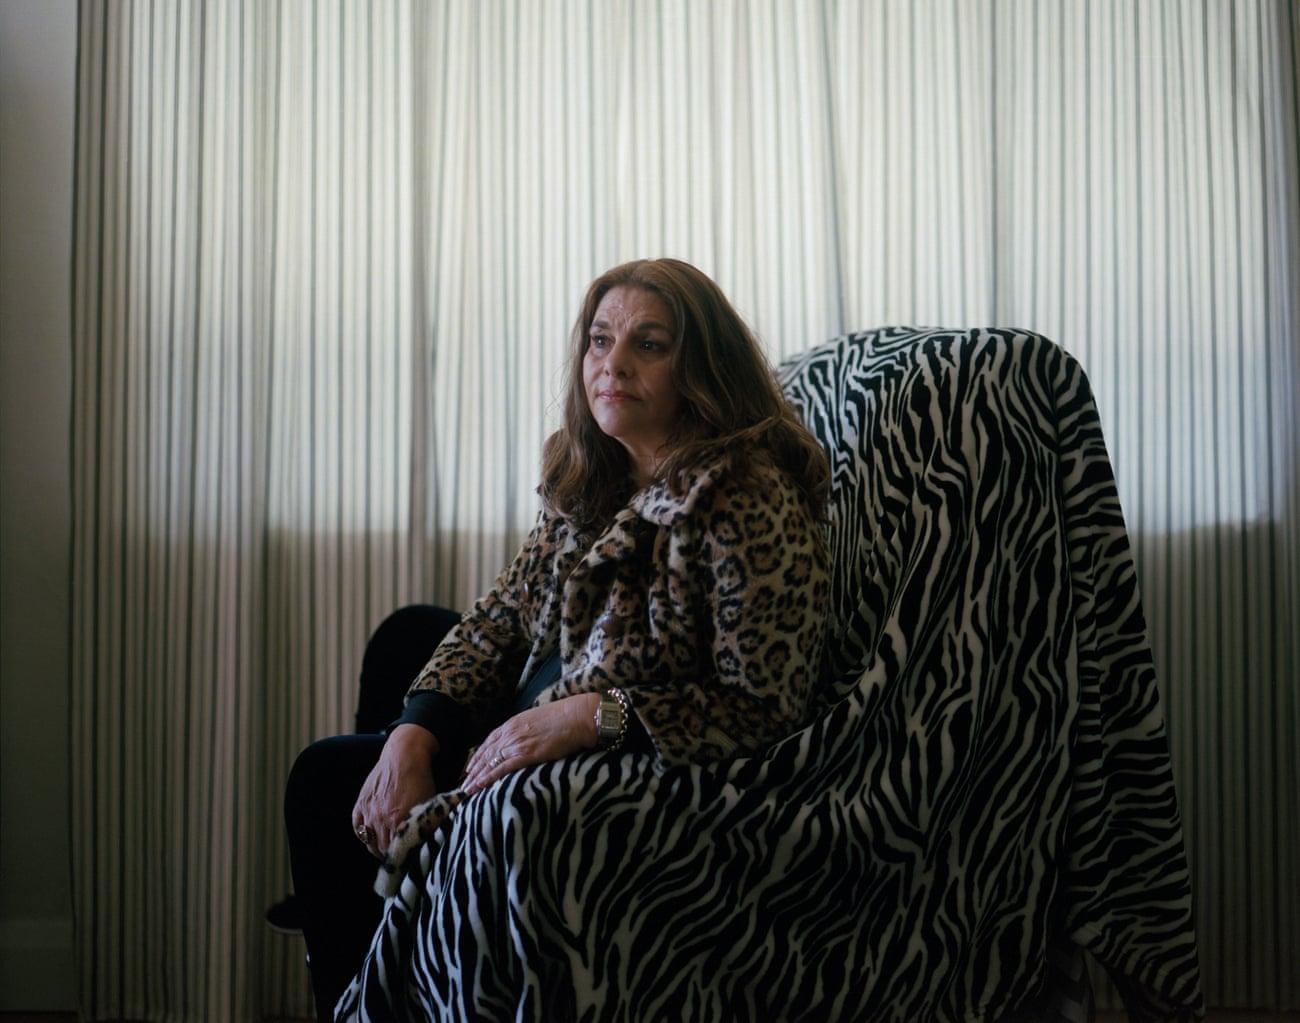 Anna Cottee, 58